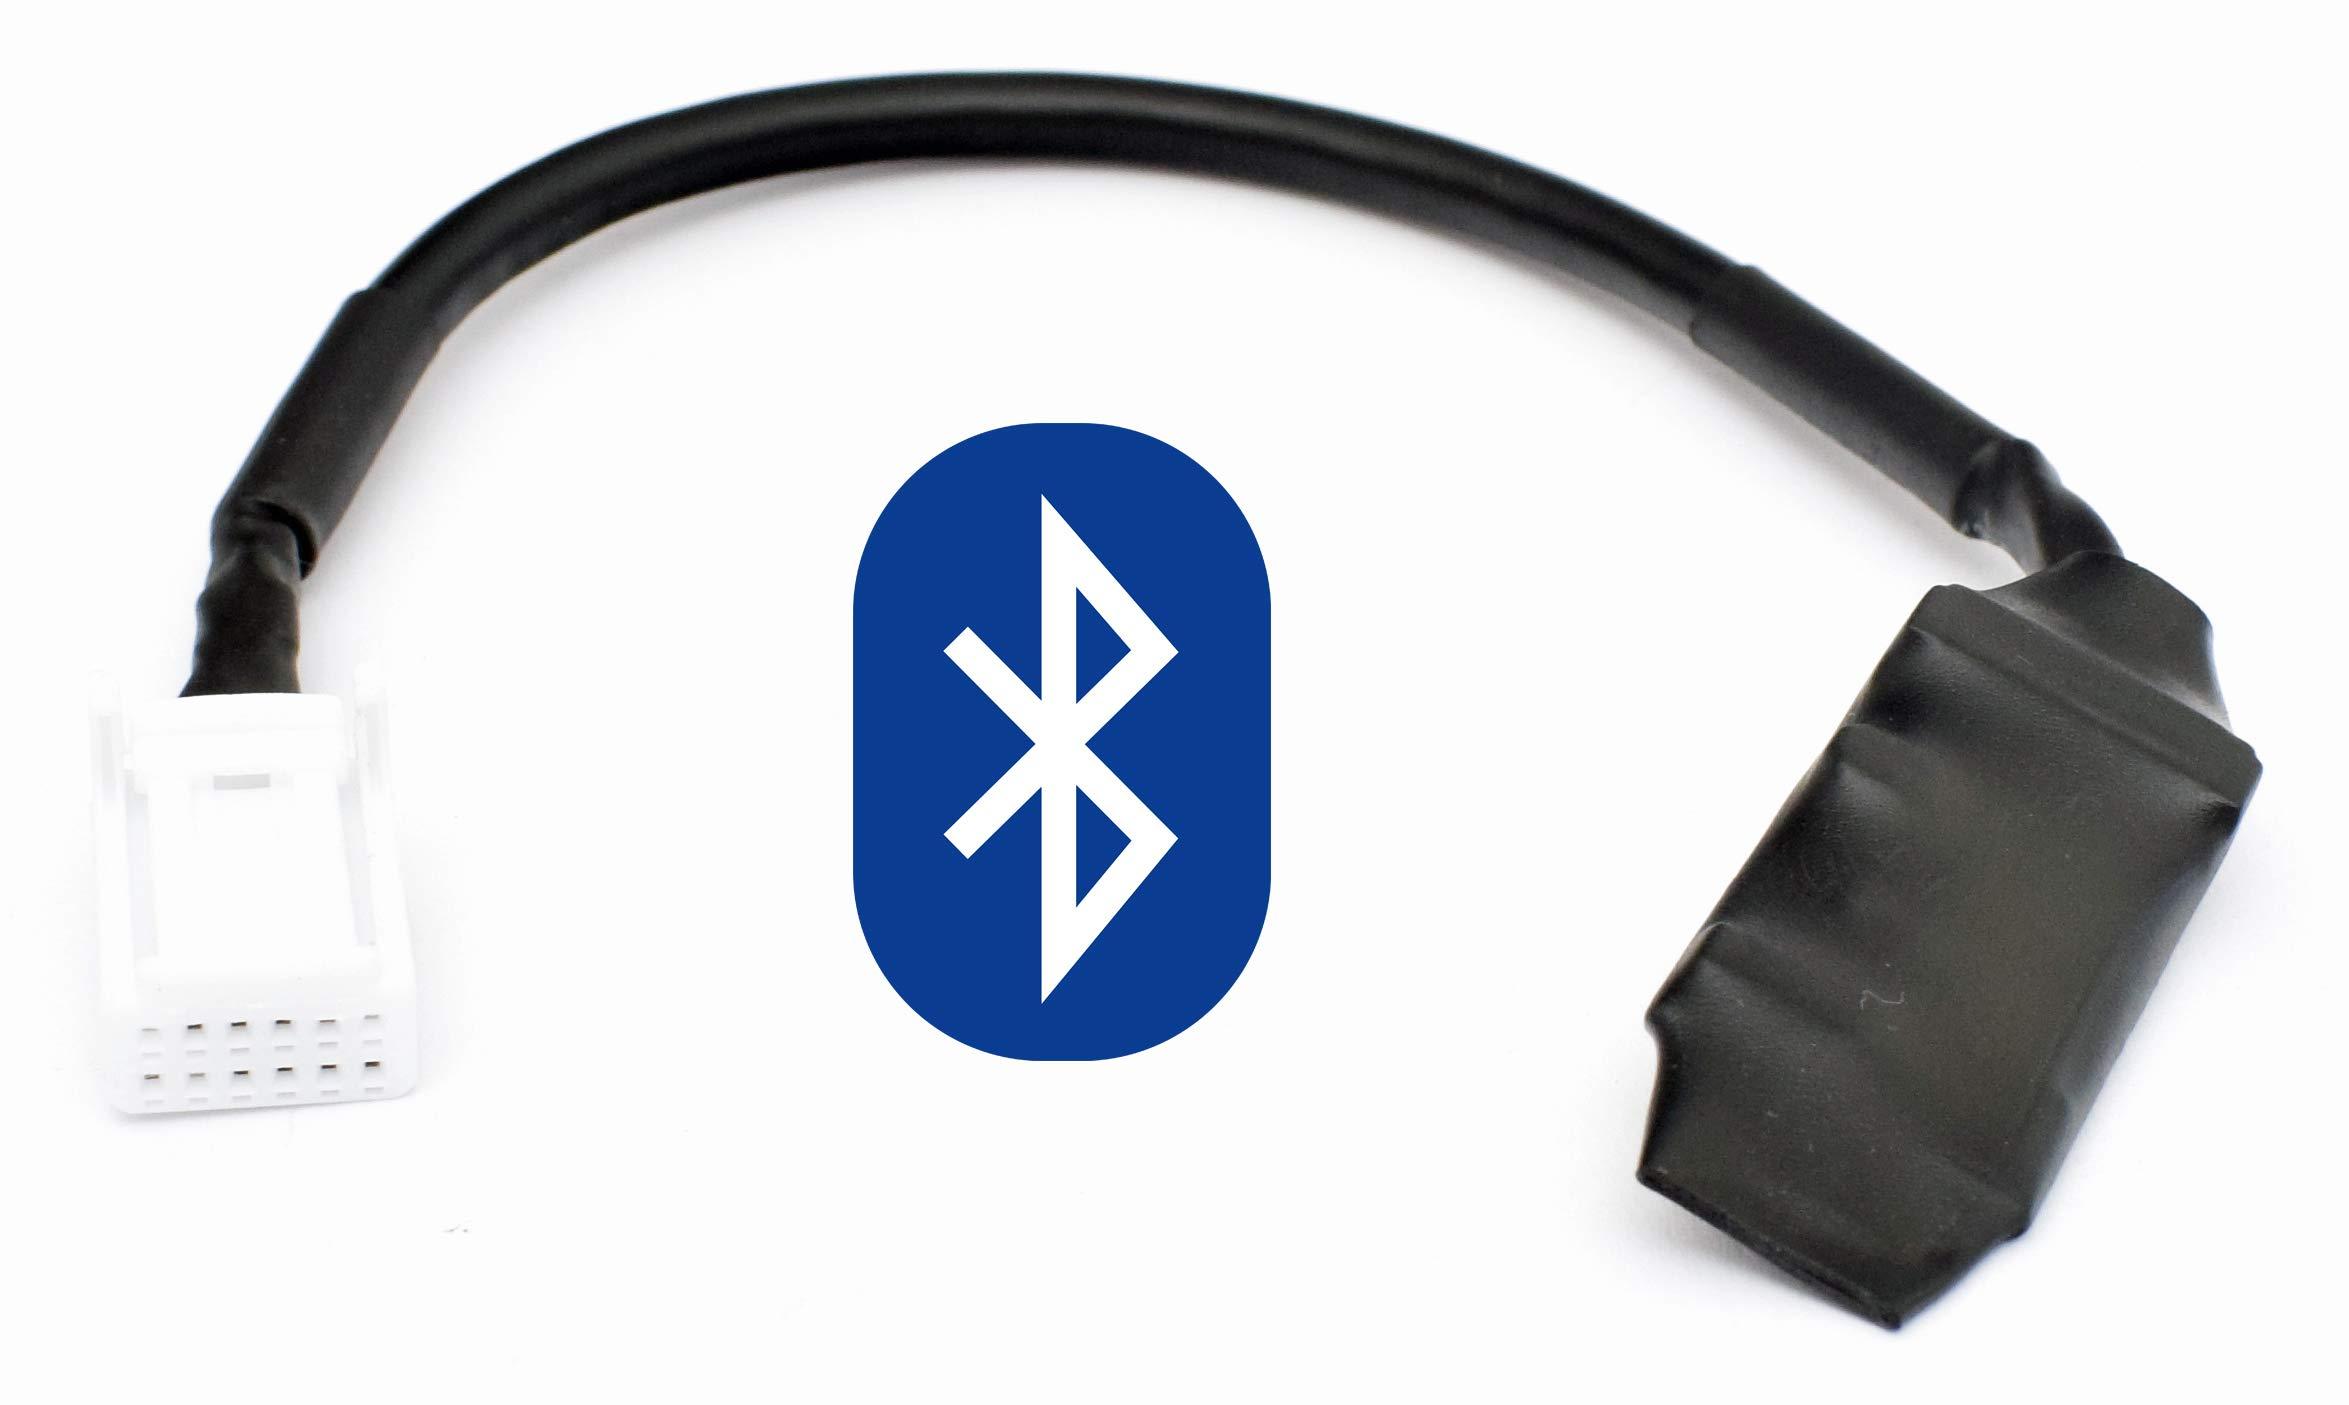 Bluetooth-Audio-Interface-66-fr-Toyota-Auris-Avensis-T25-T27-Corolla-Hilux-Prius-RAV4-Yaris-XP9-Land-Cruiser-J1220-Lexus-is-250-300-is-F-GS-RX-LS-350-430